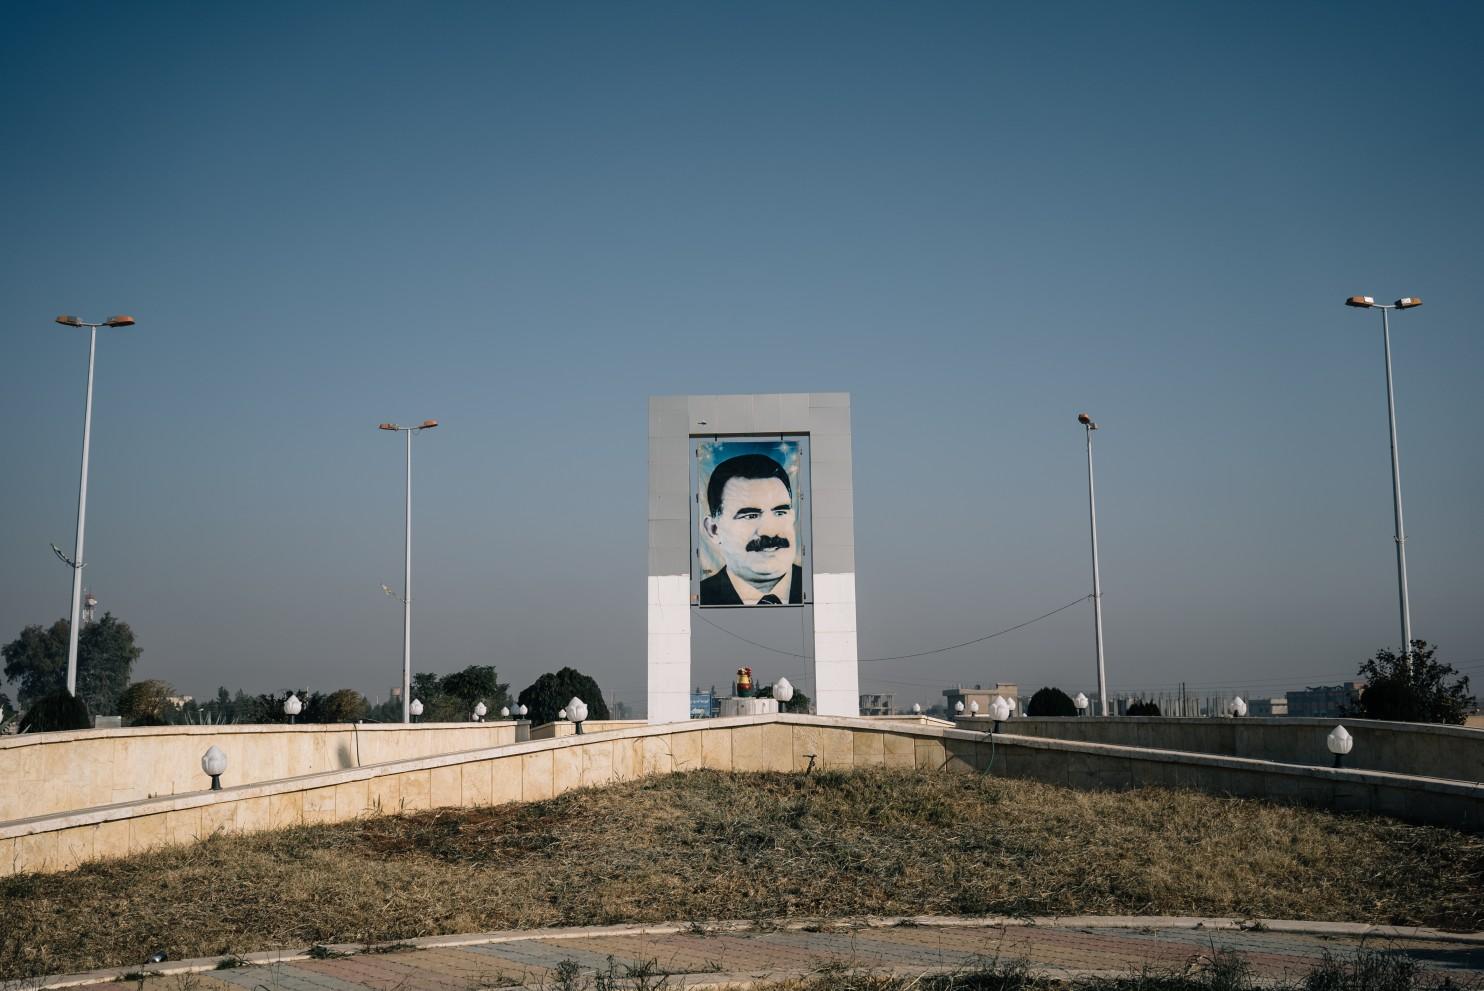 u s military aid is fueling big ambitions for syria s leftist kurdish militia source